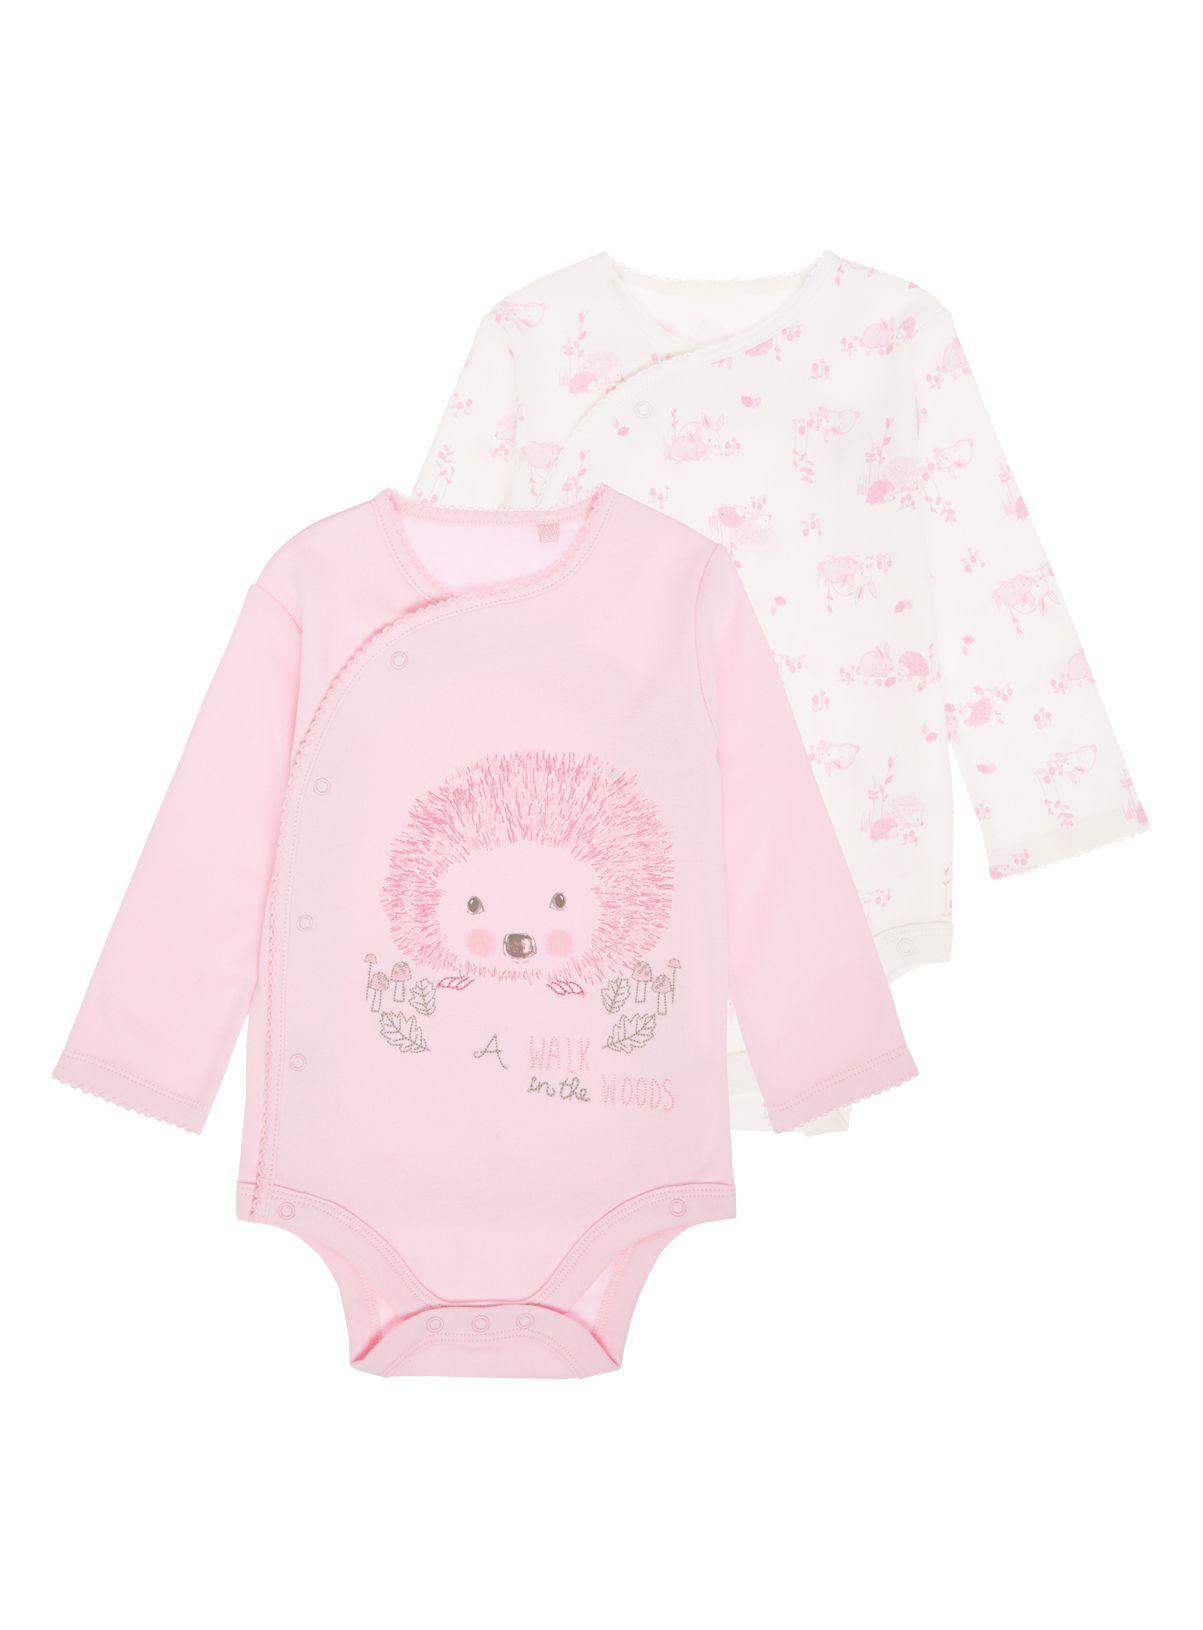 de28cc07300 Baby Girls Pink Hedgehog Bodysuits 2 Pack (0-24 months)